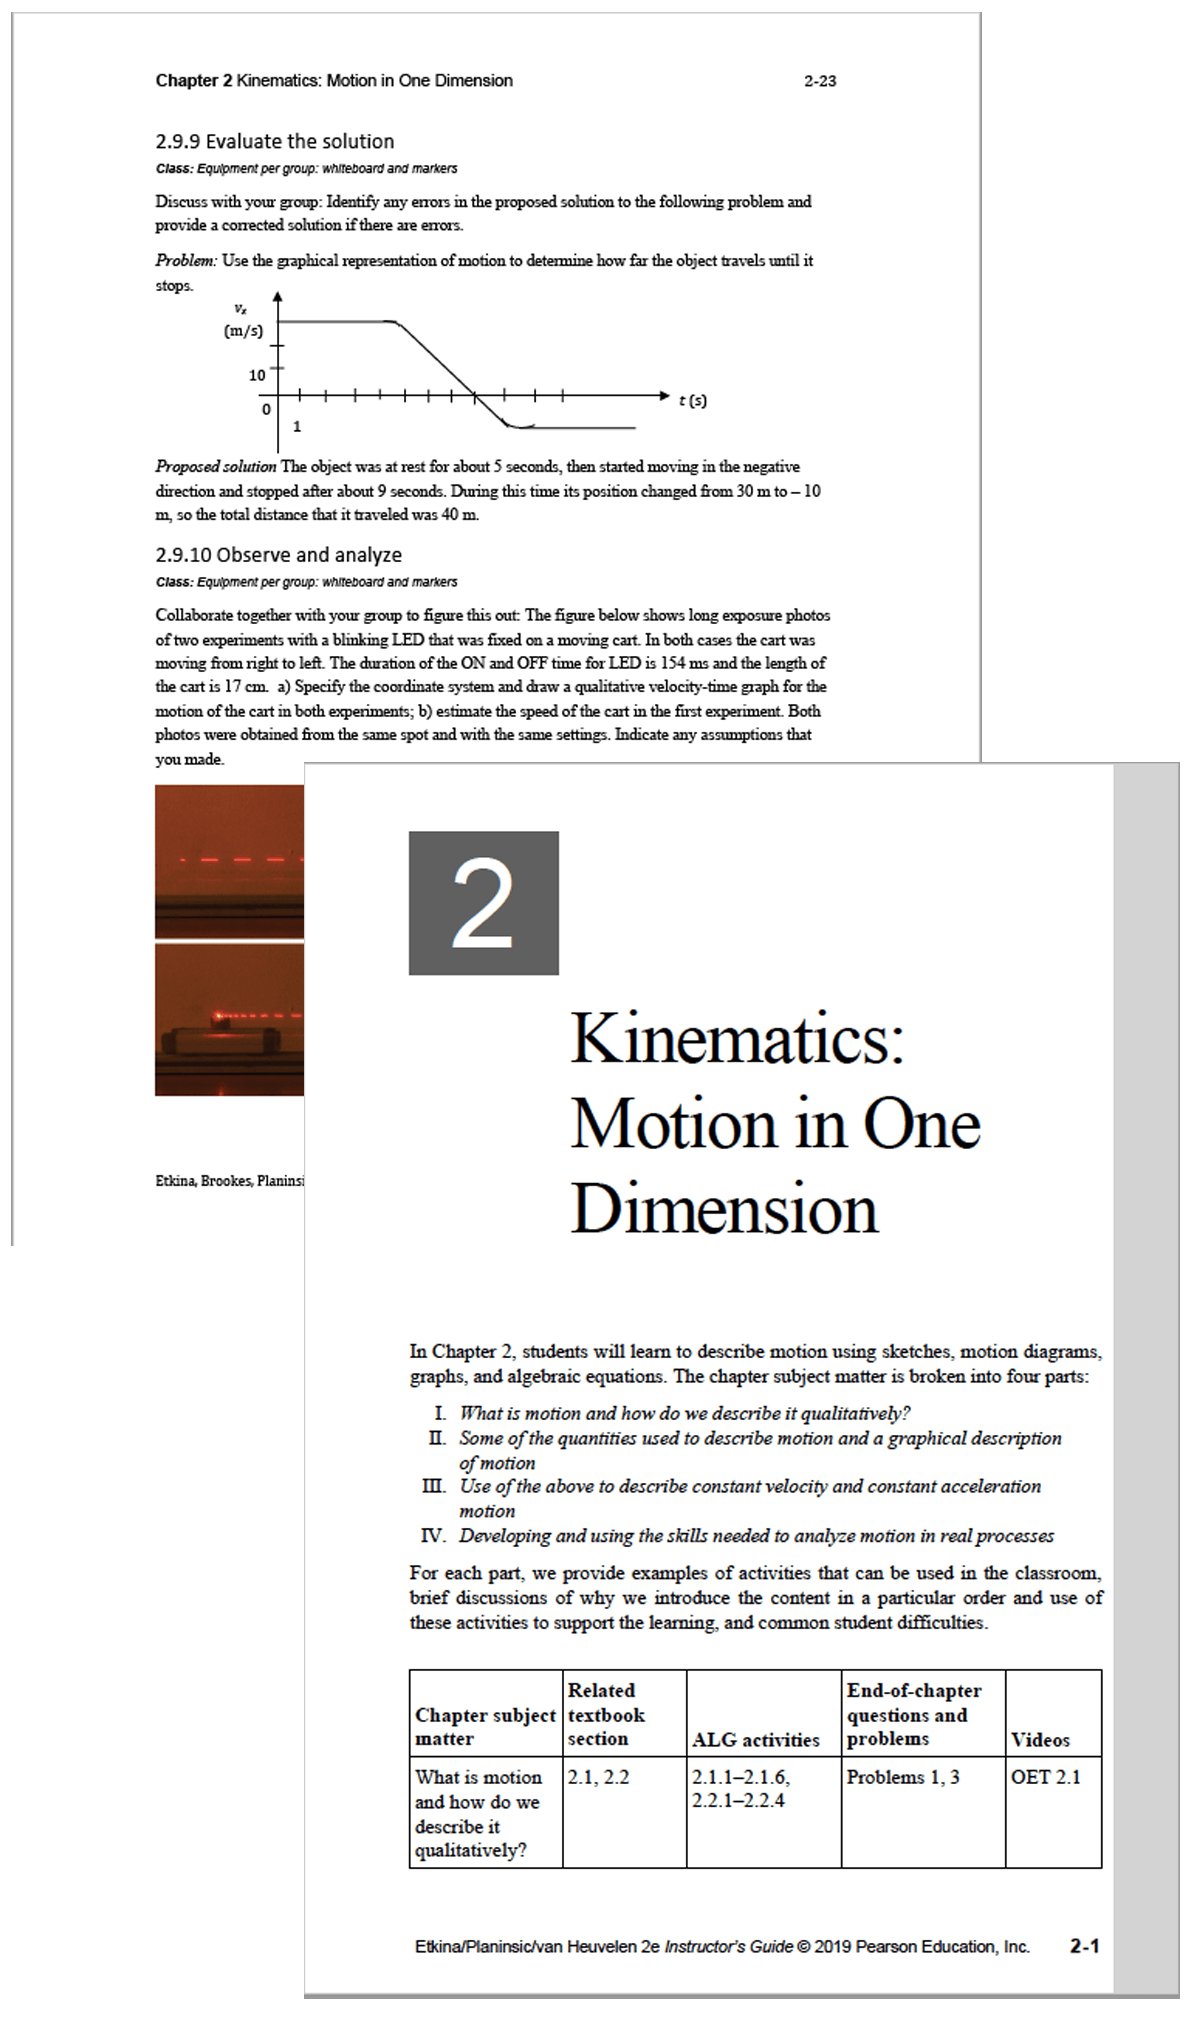 Etkina, Planinsic & Van Heuvelen, College Physics: Explore